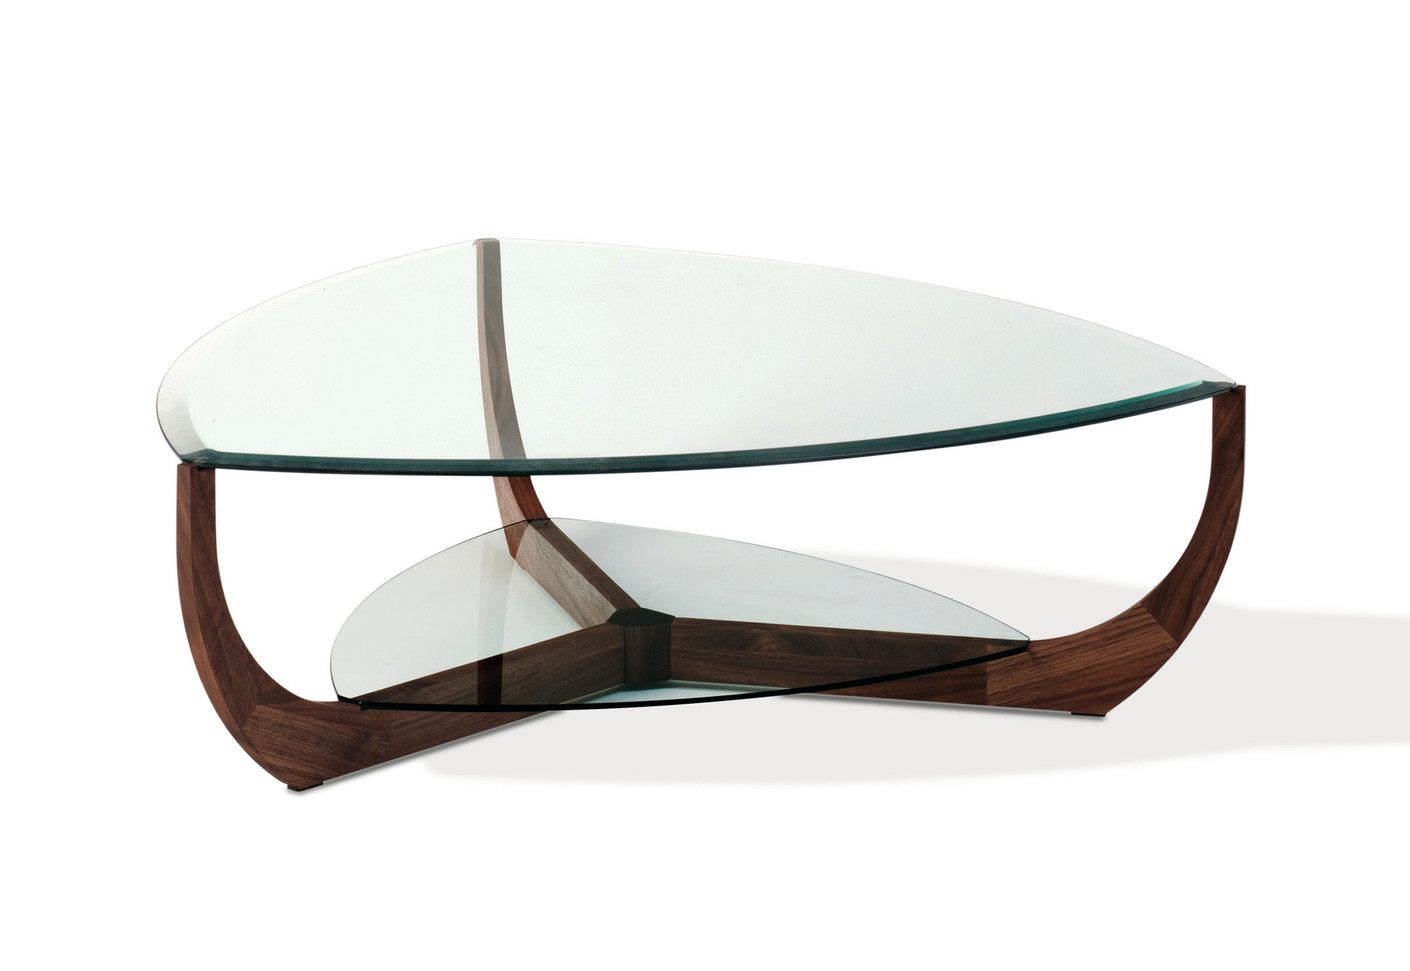 juwel coffee table triangular 1